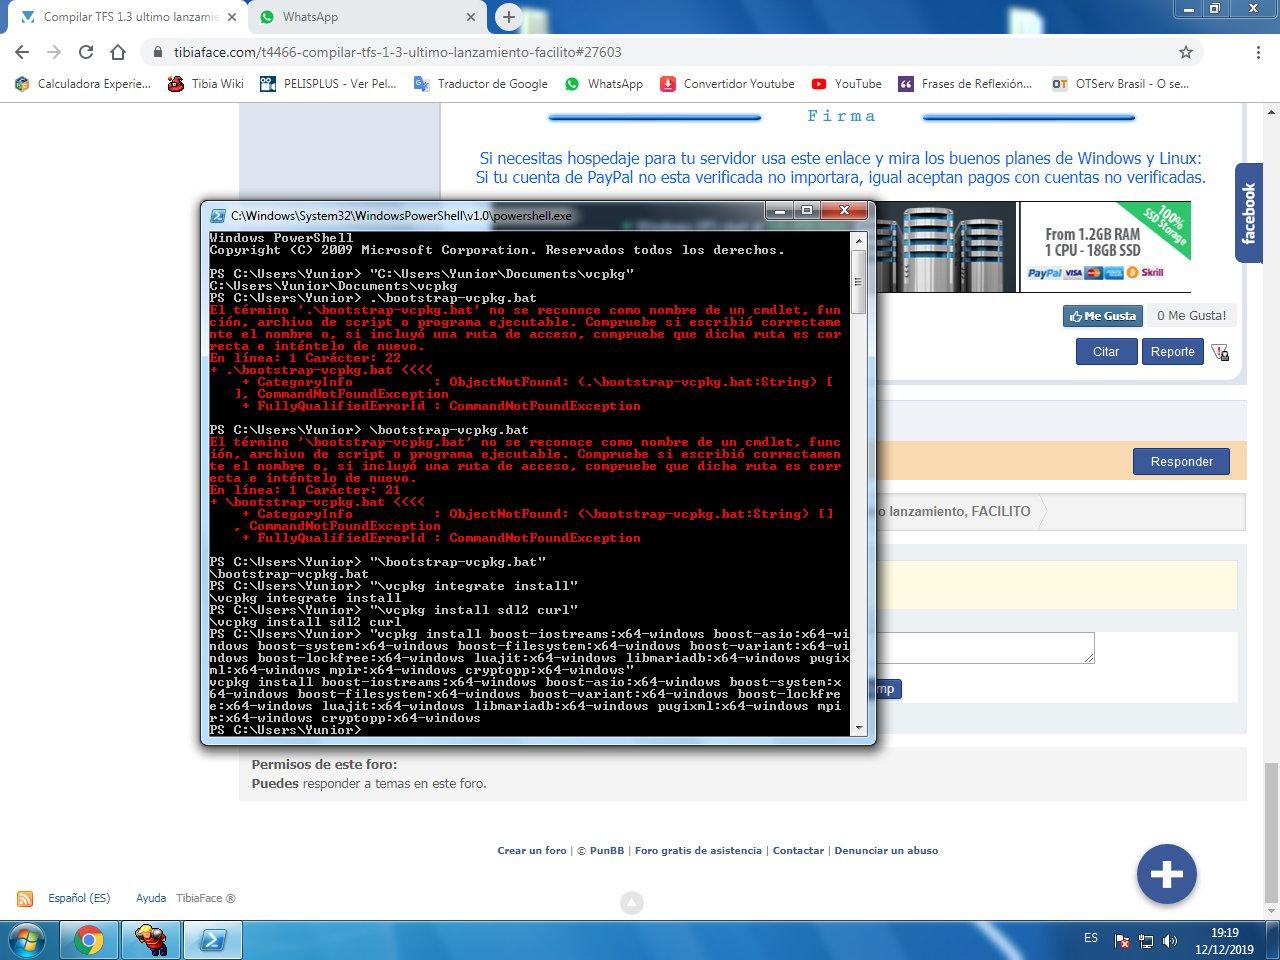 Compilar TFS 1.3 ultimo lanzamiento, FACILITO FMUjiZB